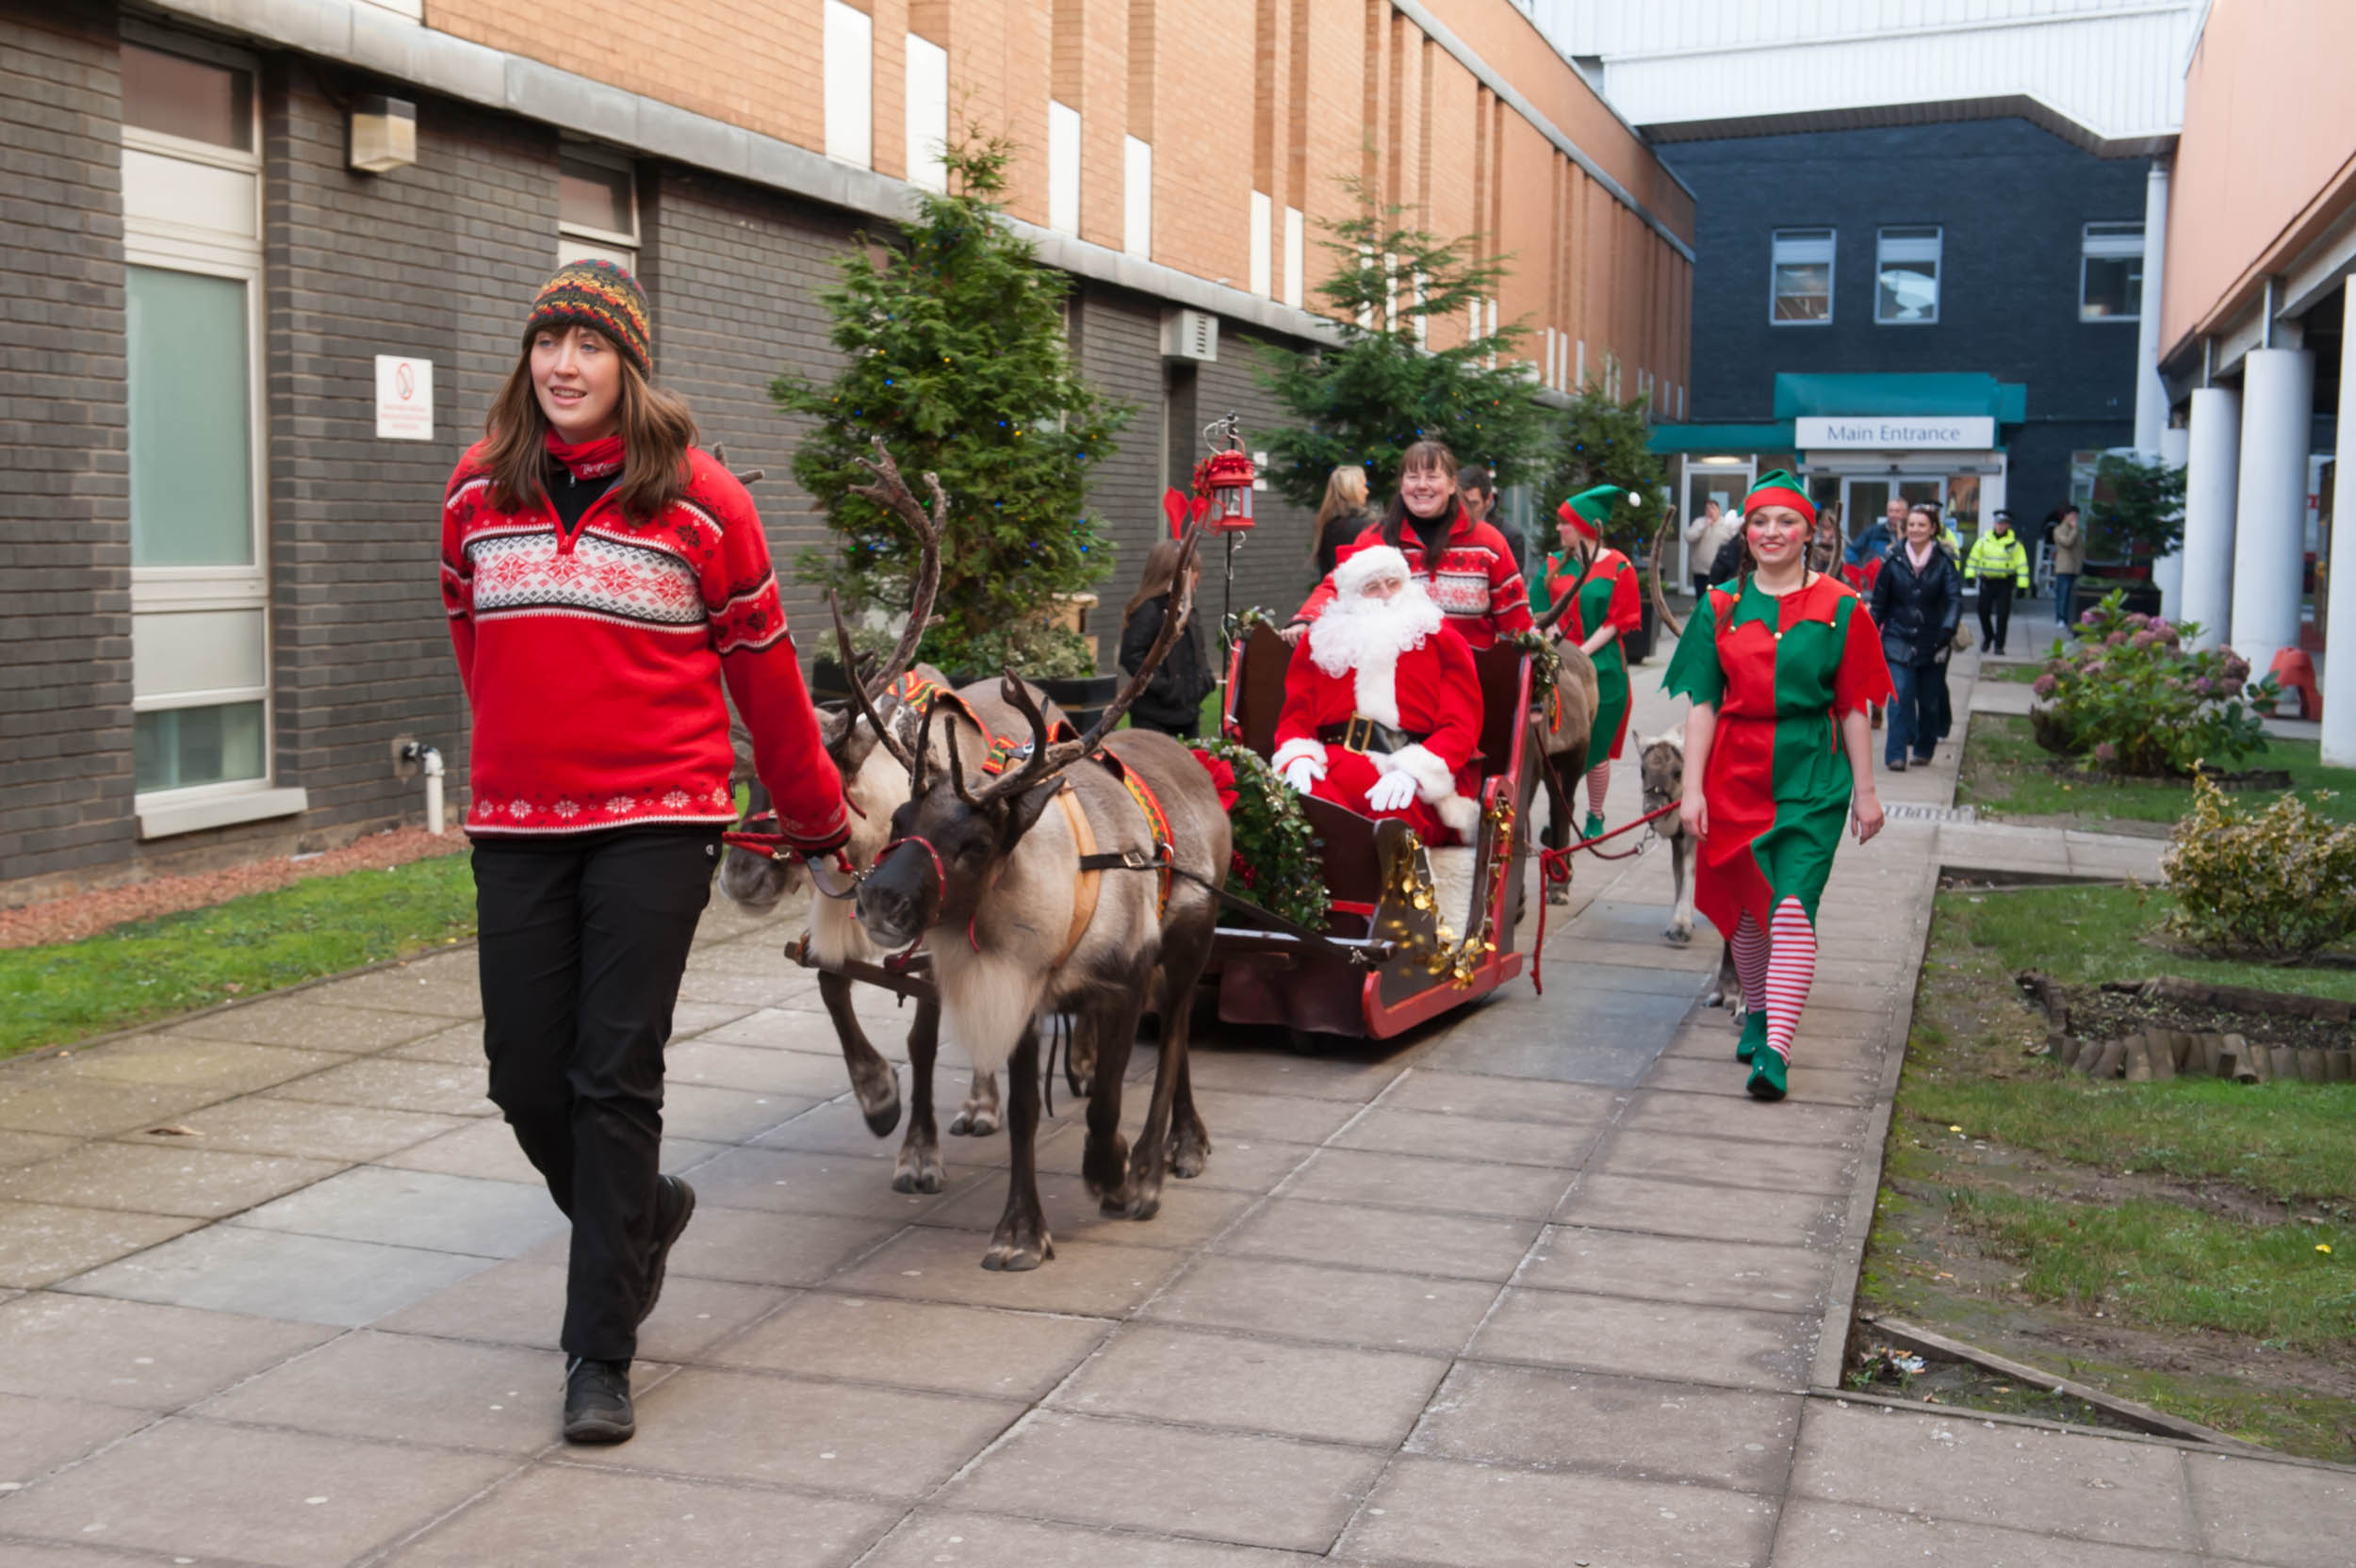 Glasgow Children's Hospital Charity PR